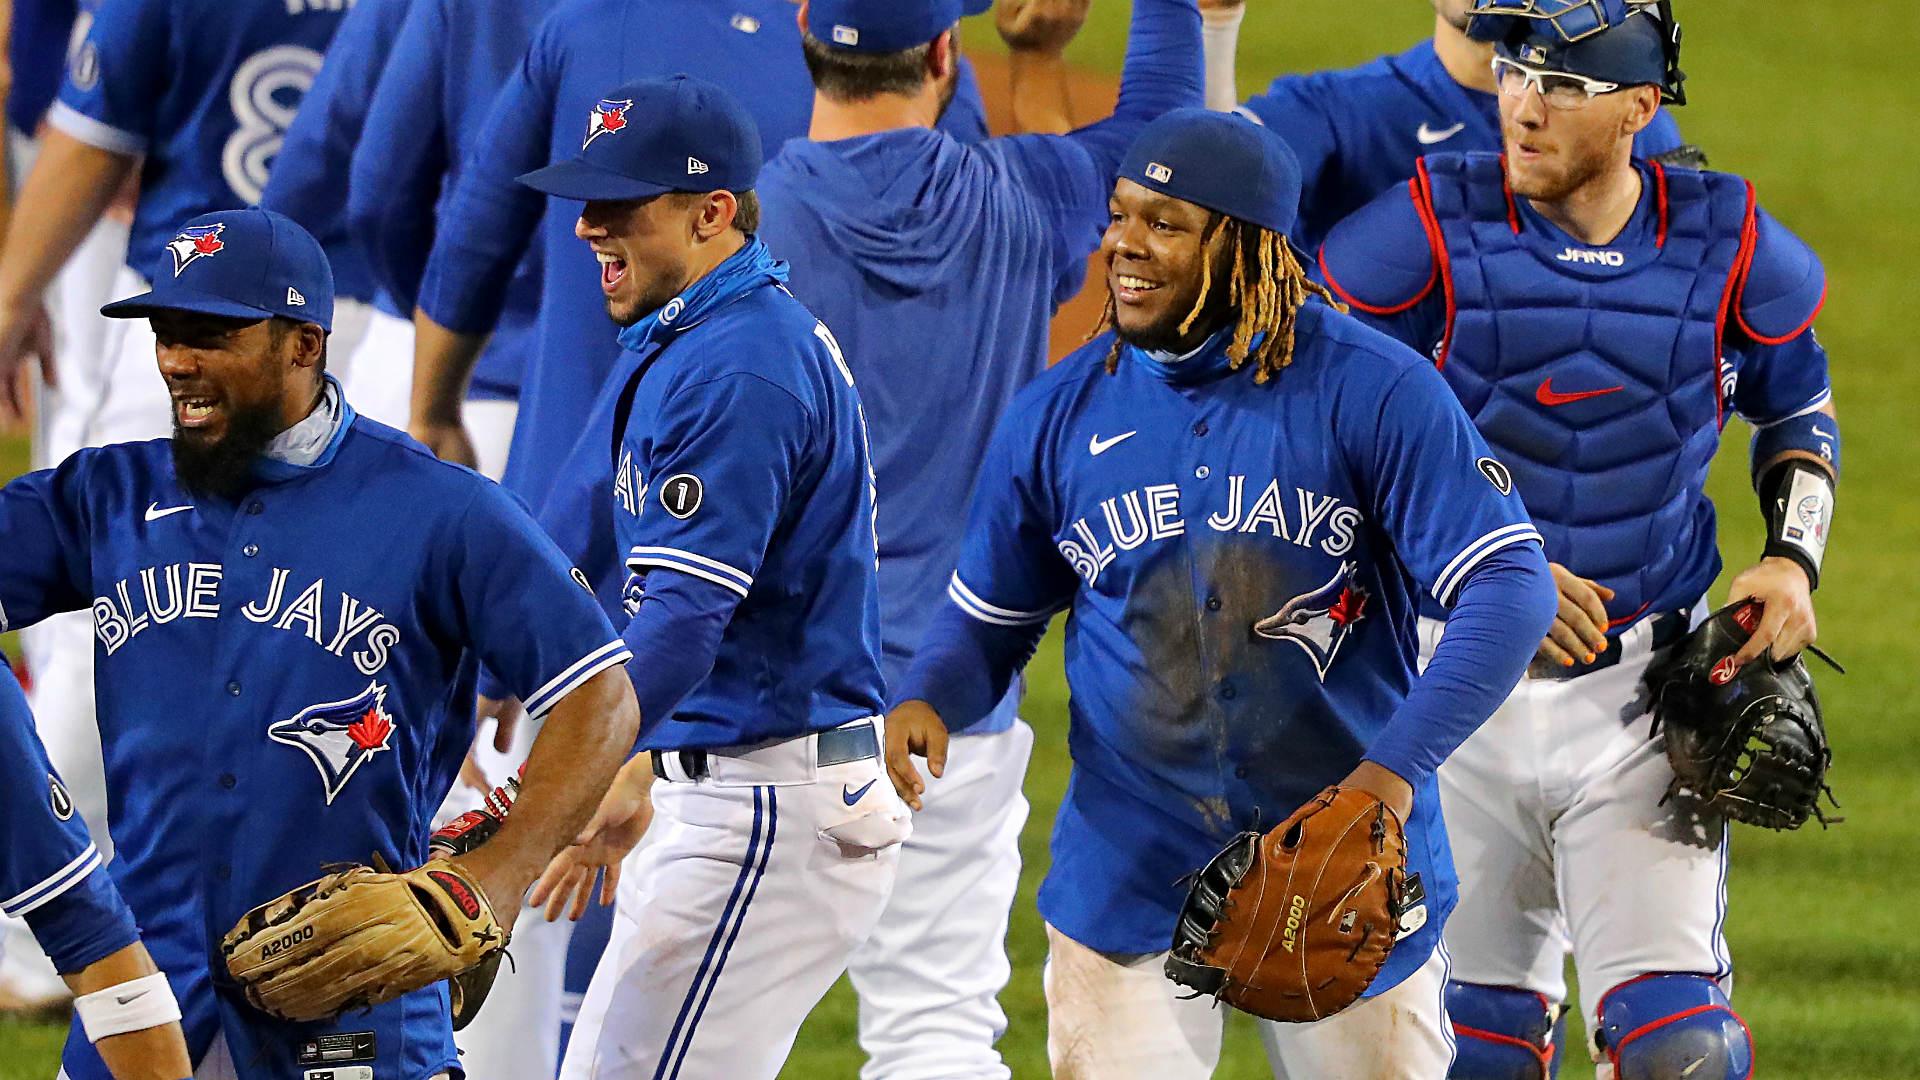 Blue Jays reach MLB playoffs: Four wild cards in Toronto's return to postseason